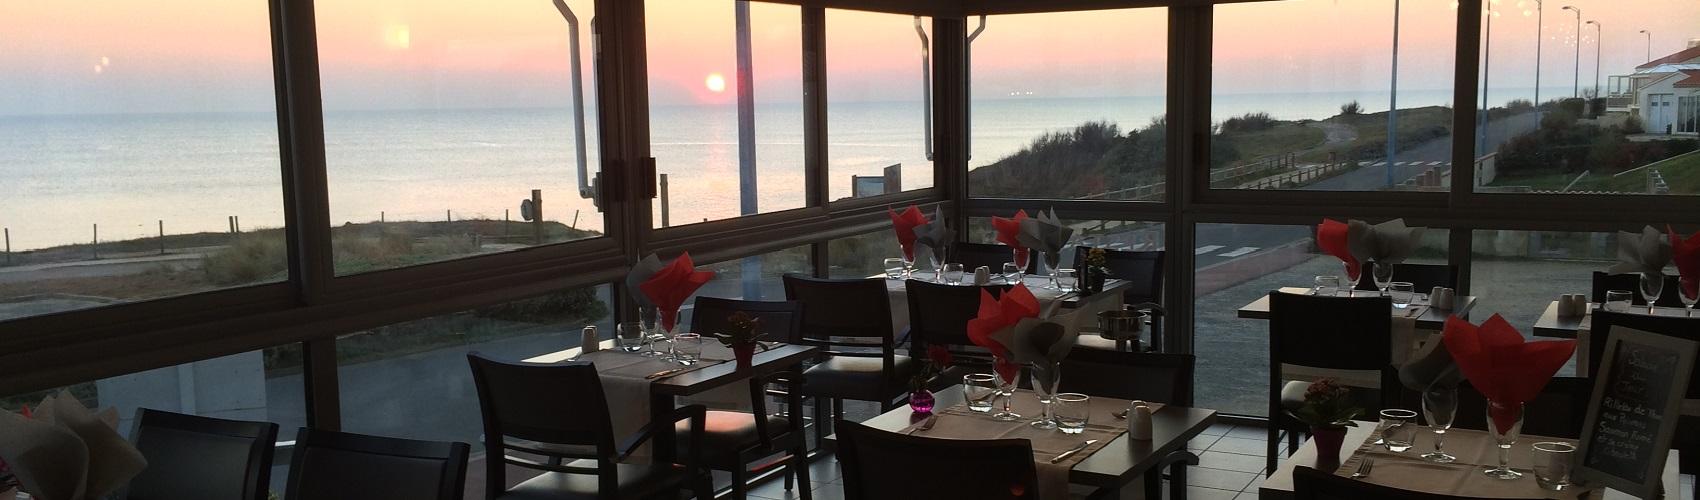 Restaurant vue face mer à Bretignolles